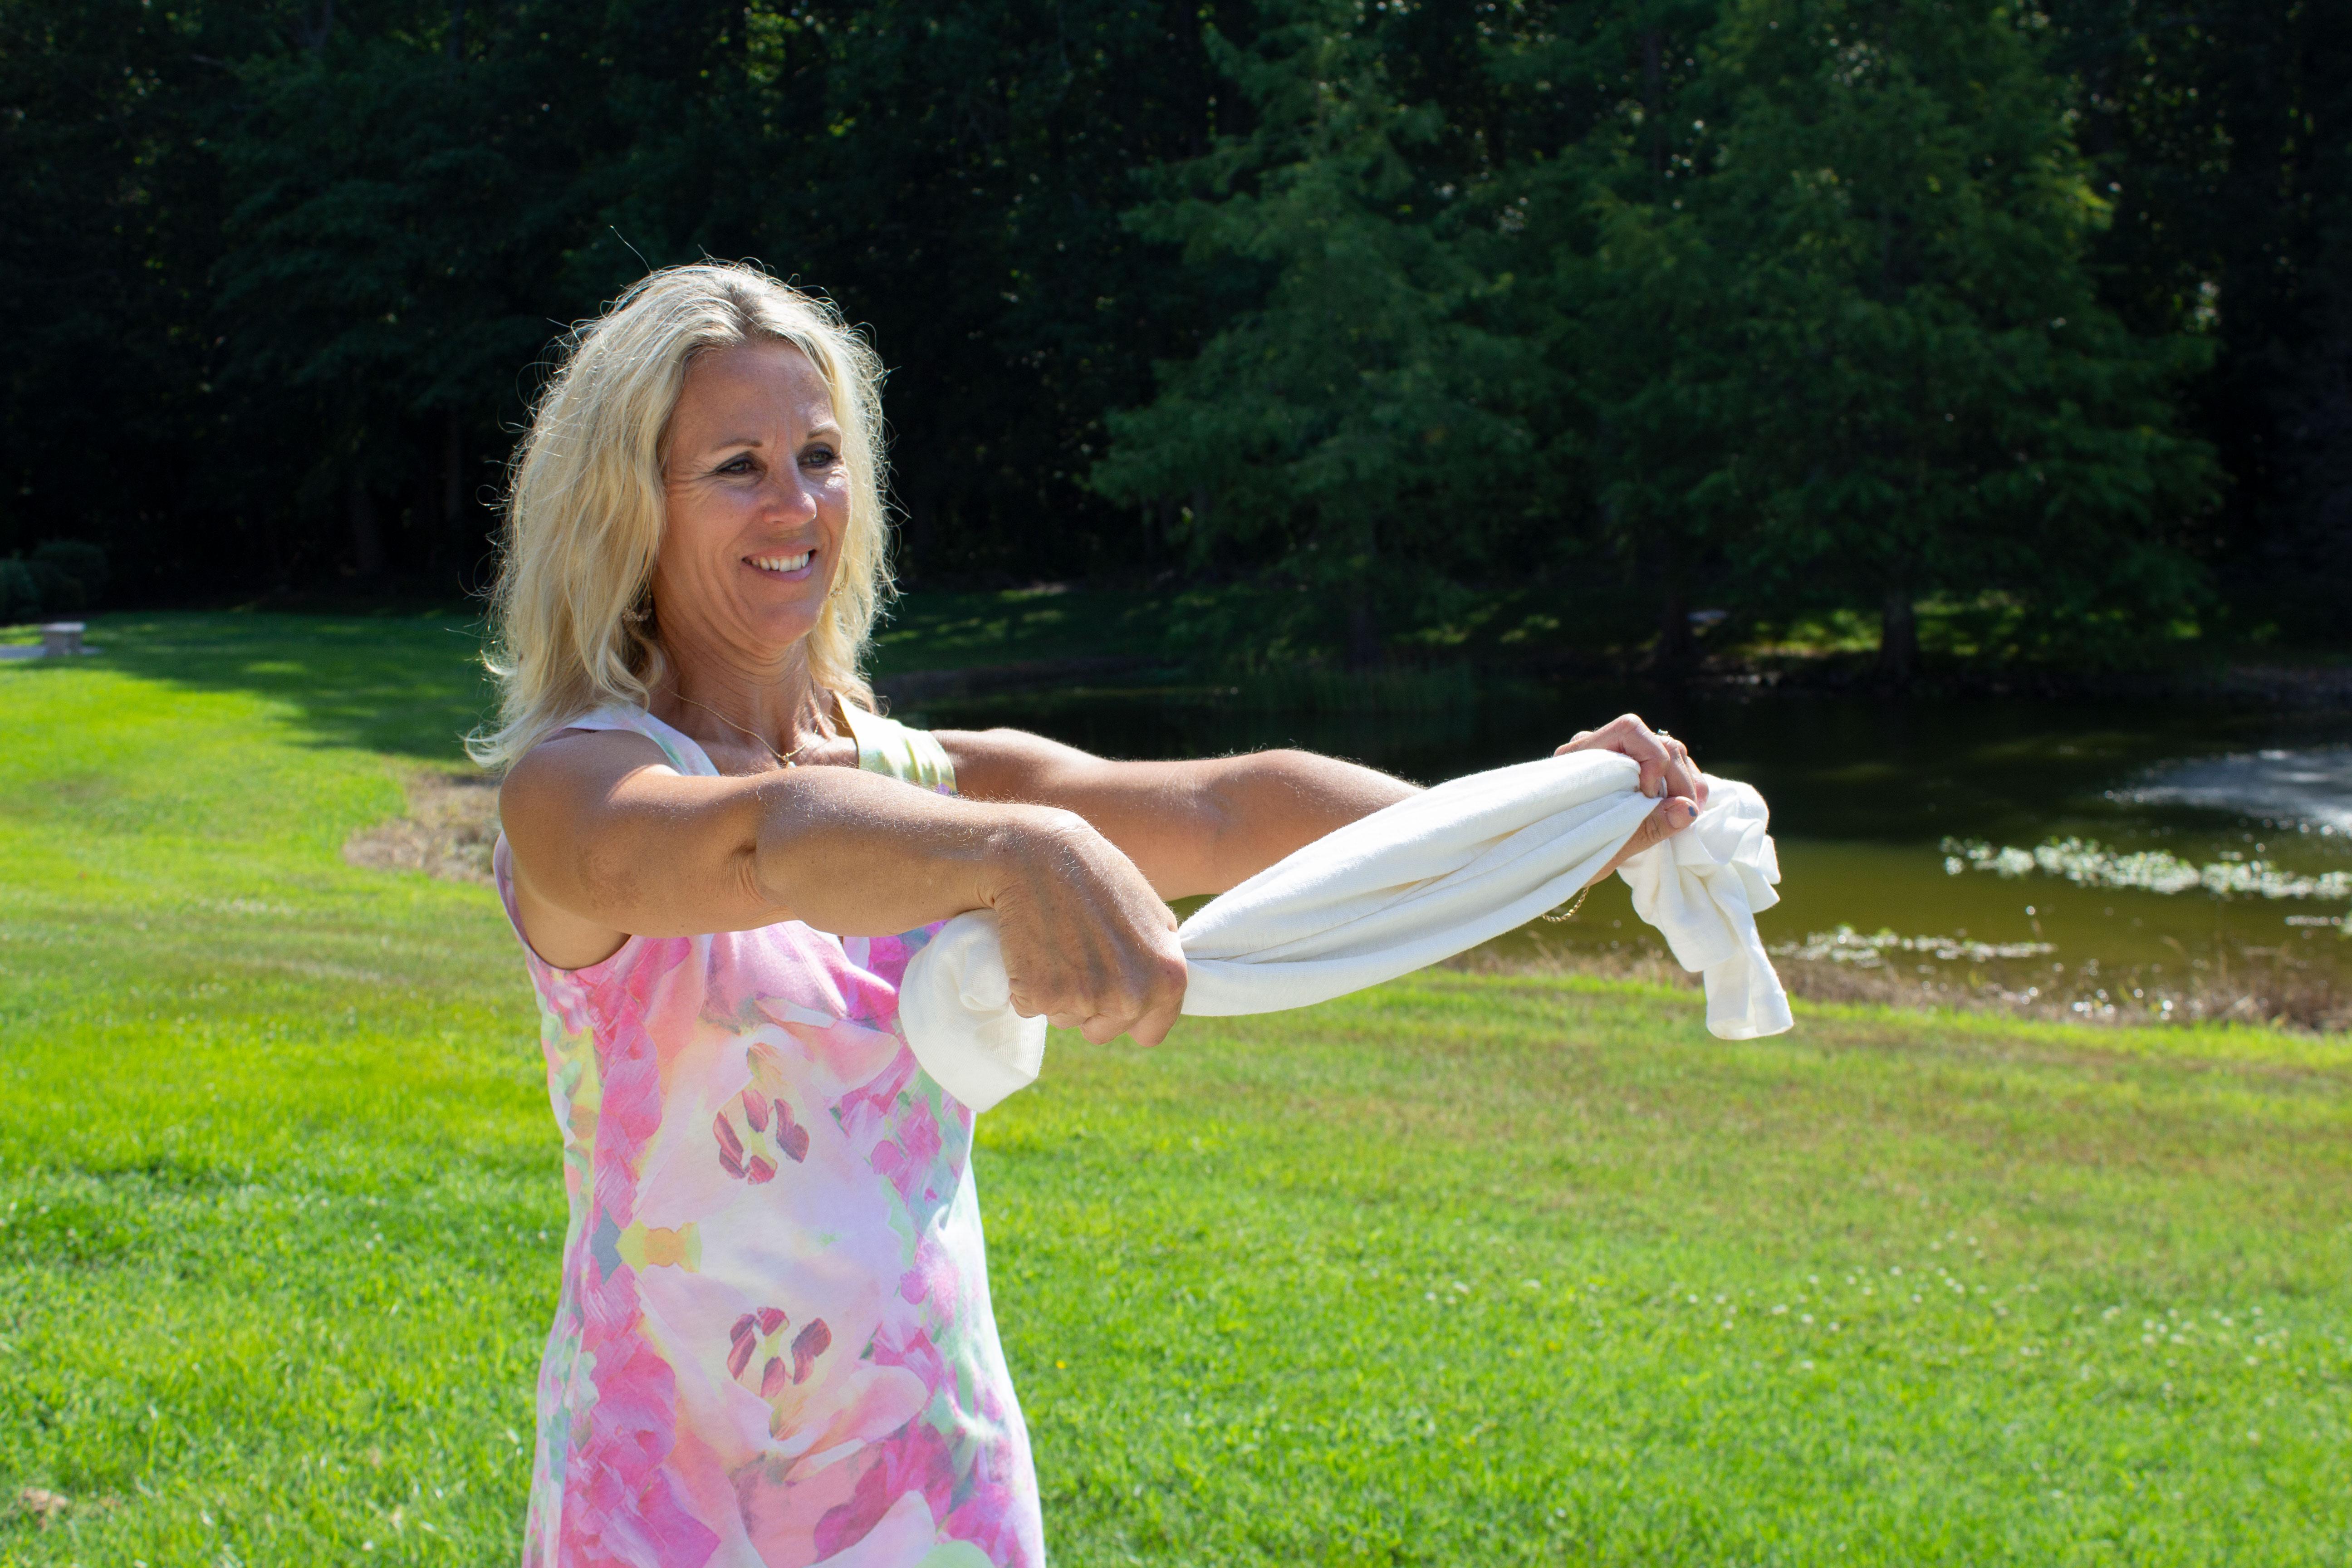 woman stretching by twisting towel